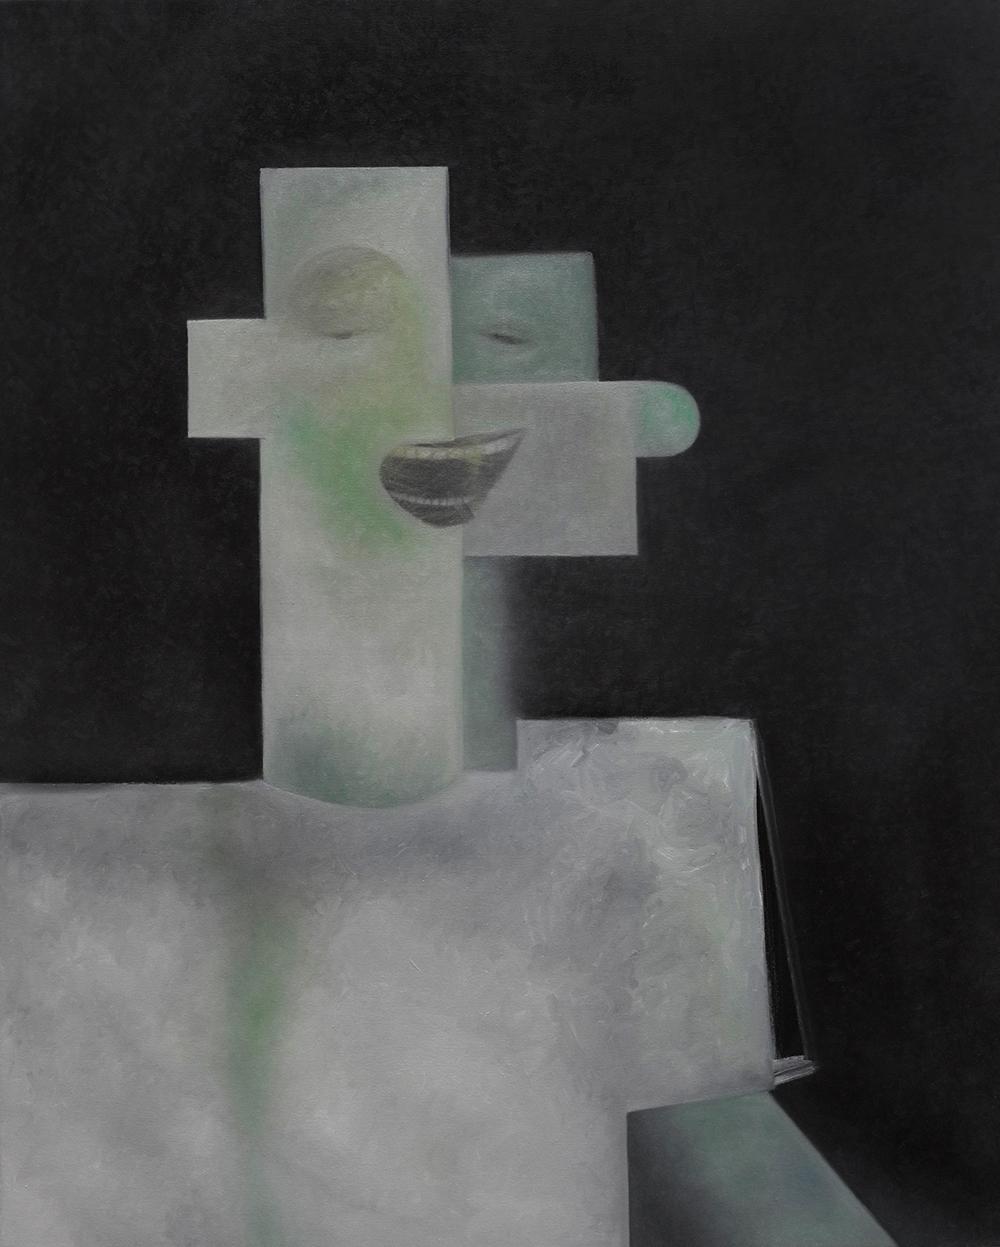 4. S. Derviz, 'Face' oil on canvas, 100x 80 cm, 2019.jpg